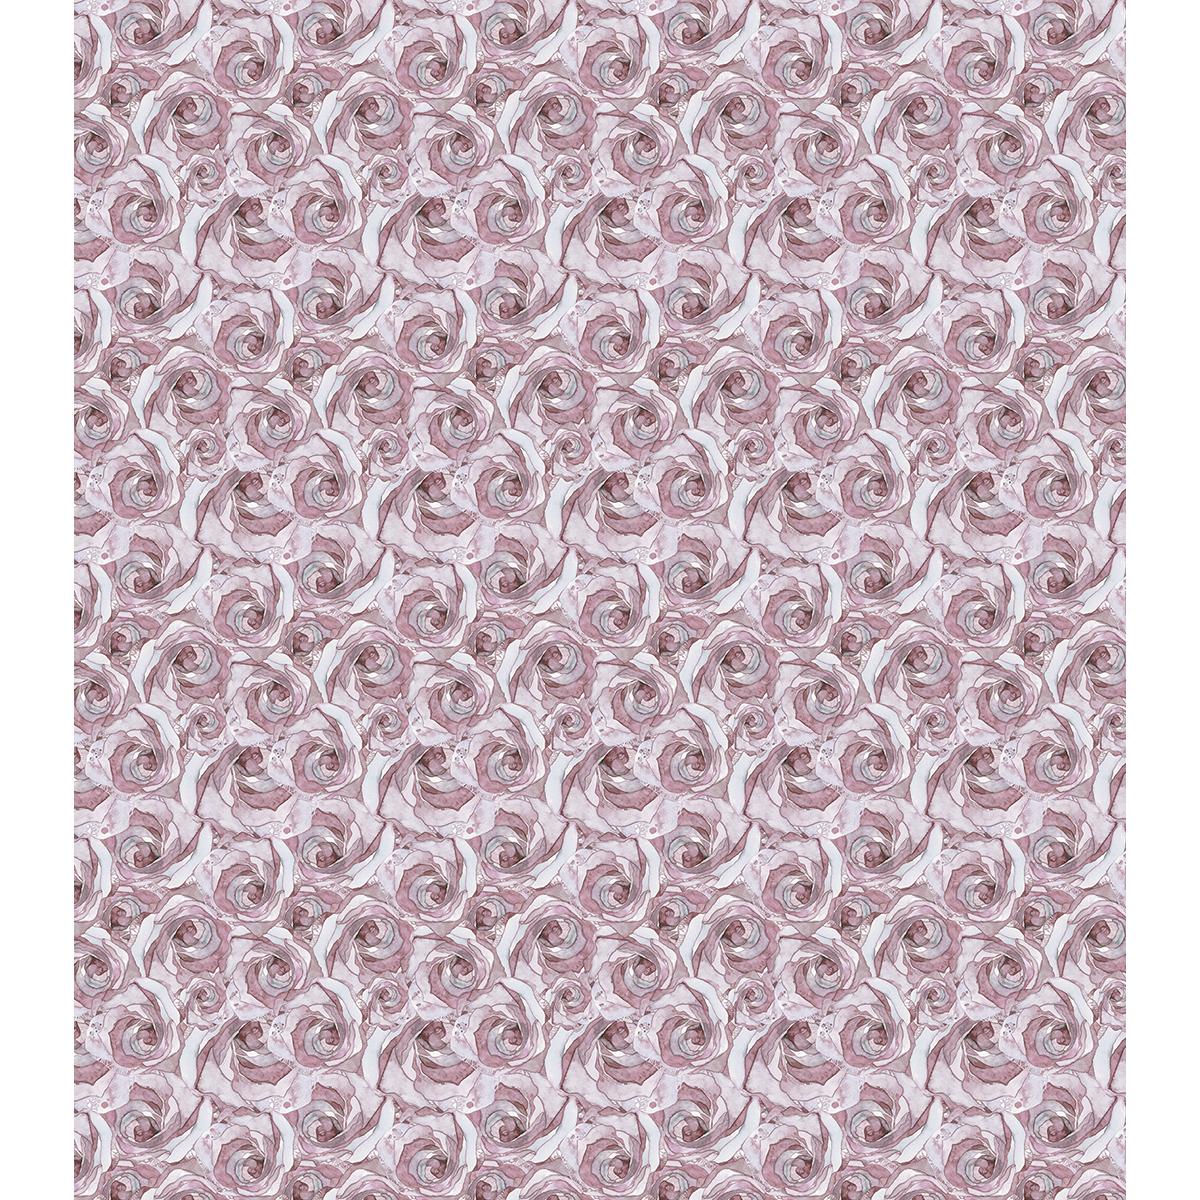 Deco Paper Blush Rose